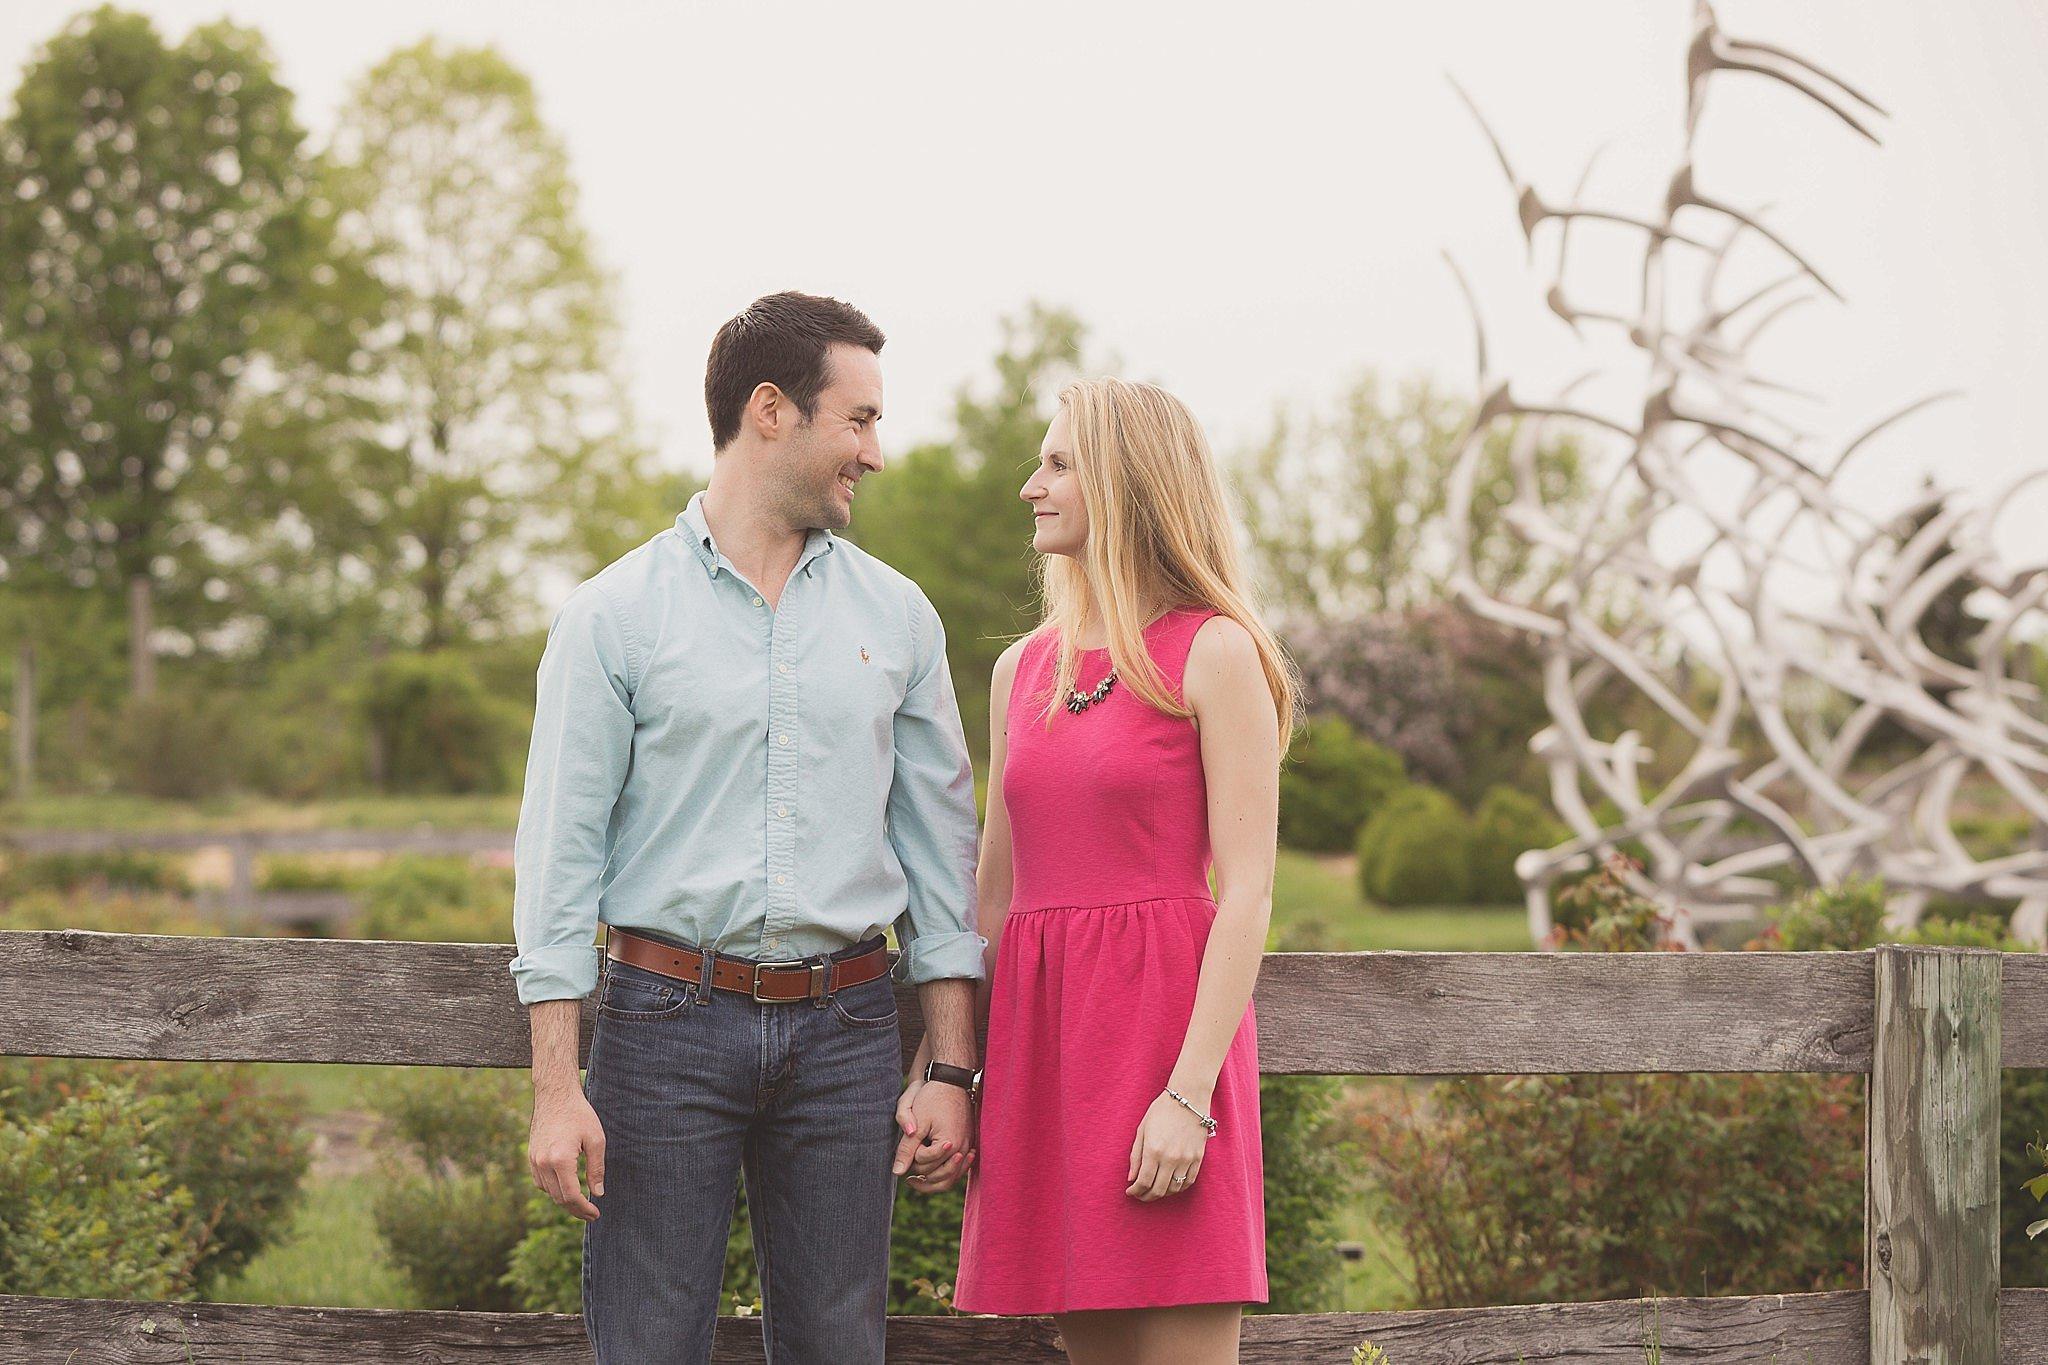 Shelby+Matt's Engagement Session at The Arboretum in Lexington, KY